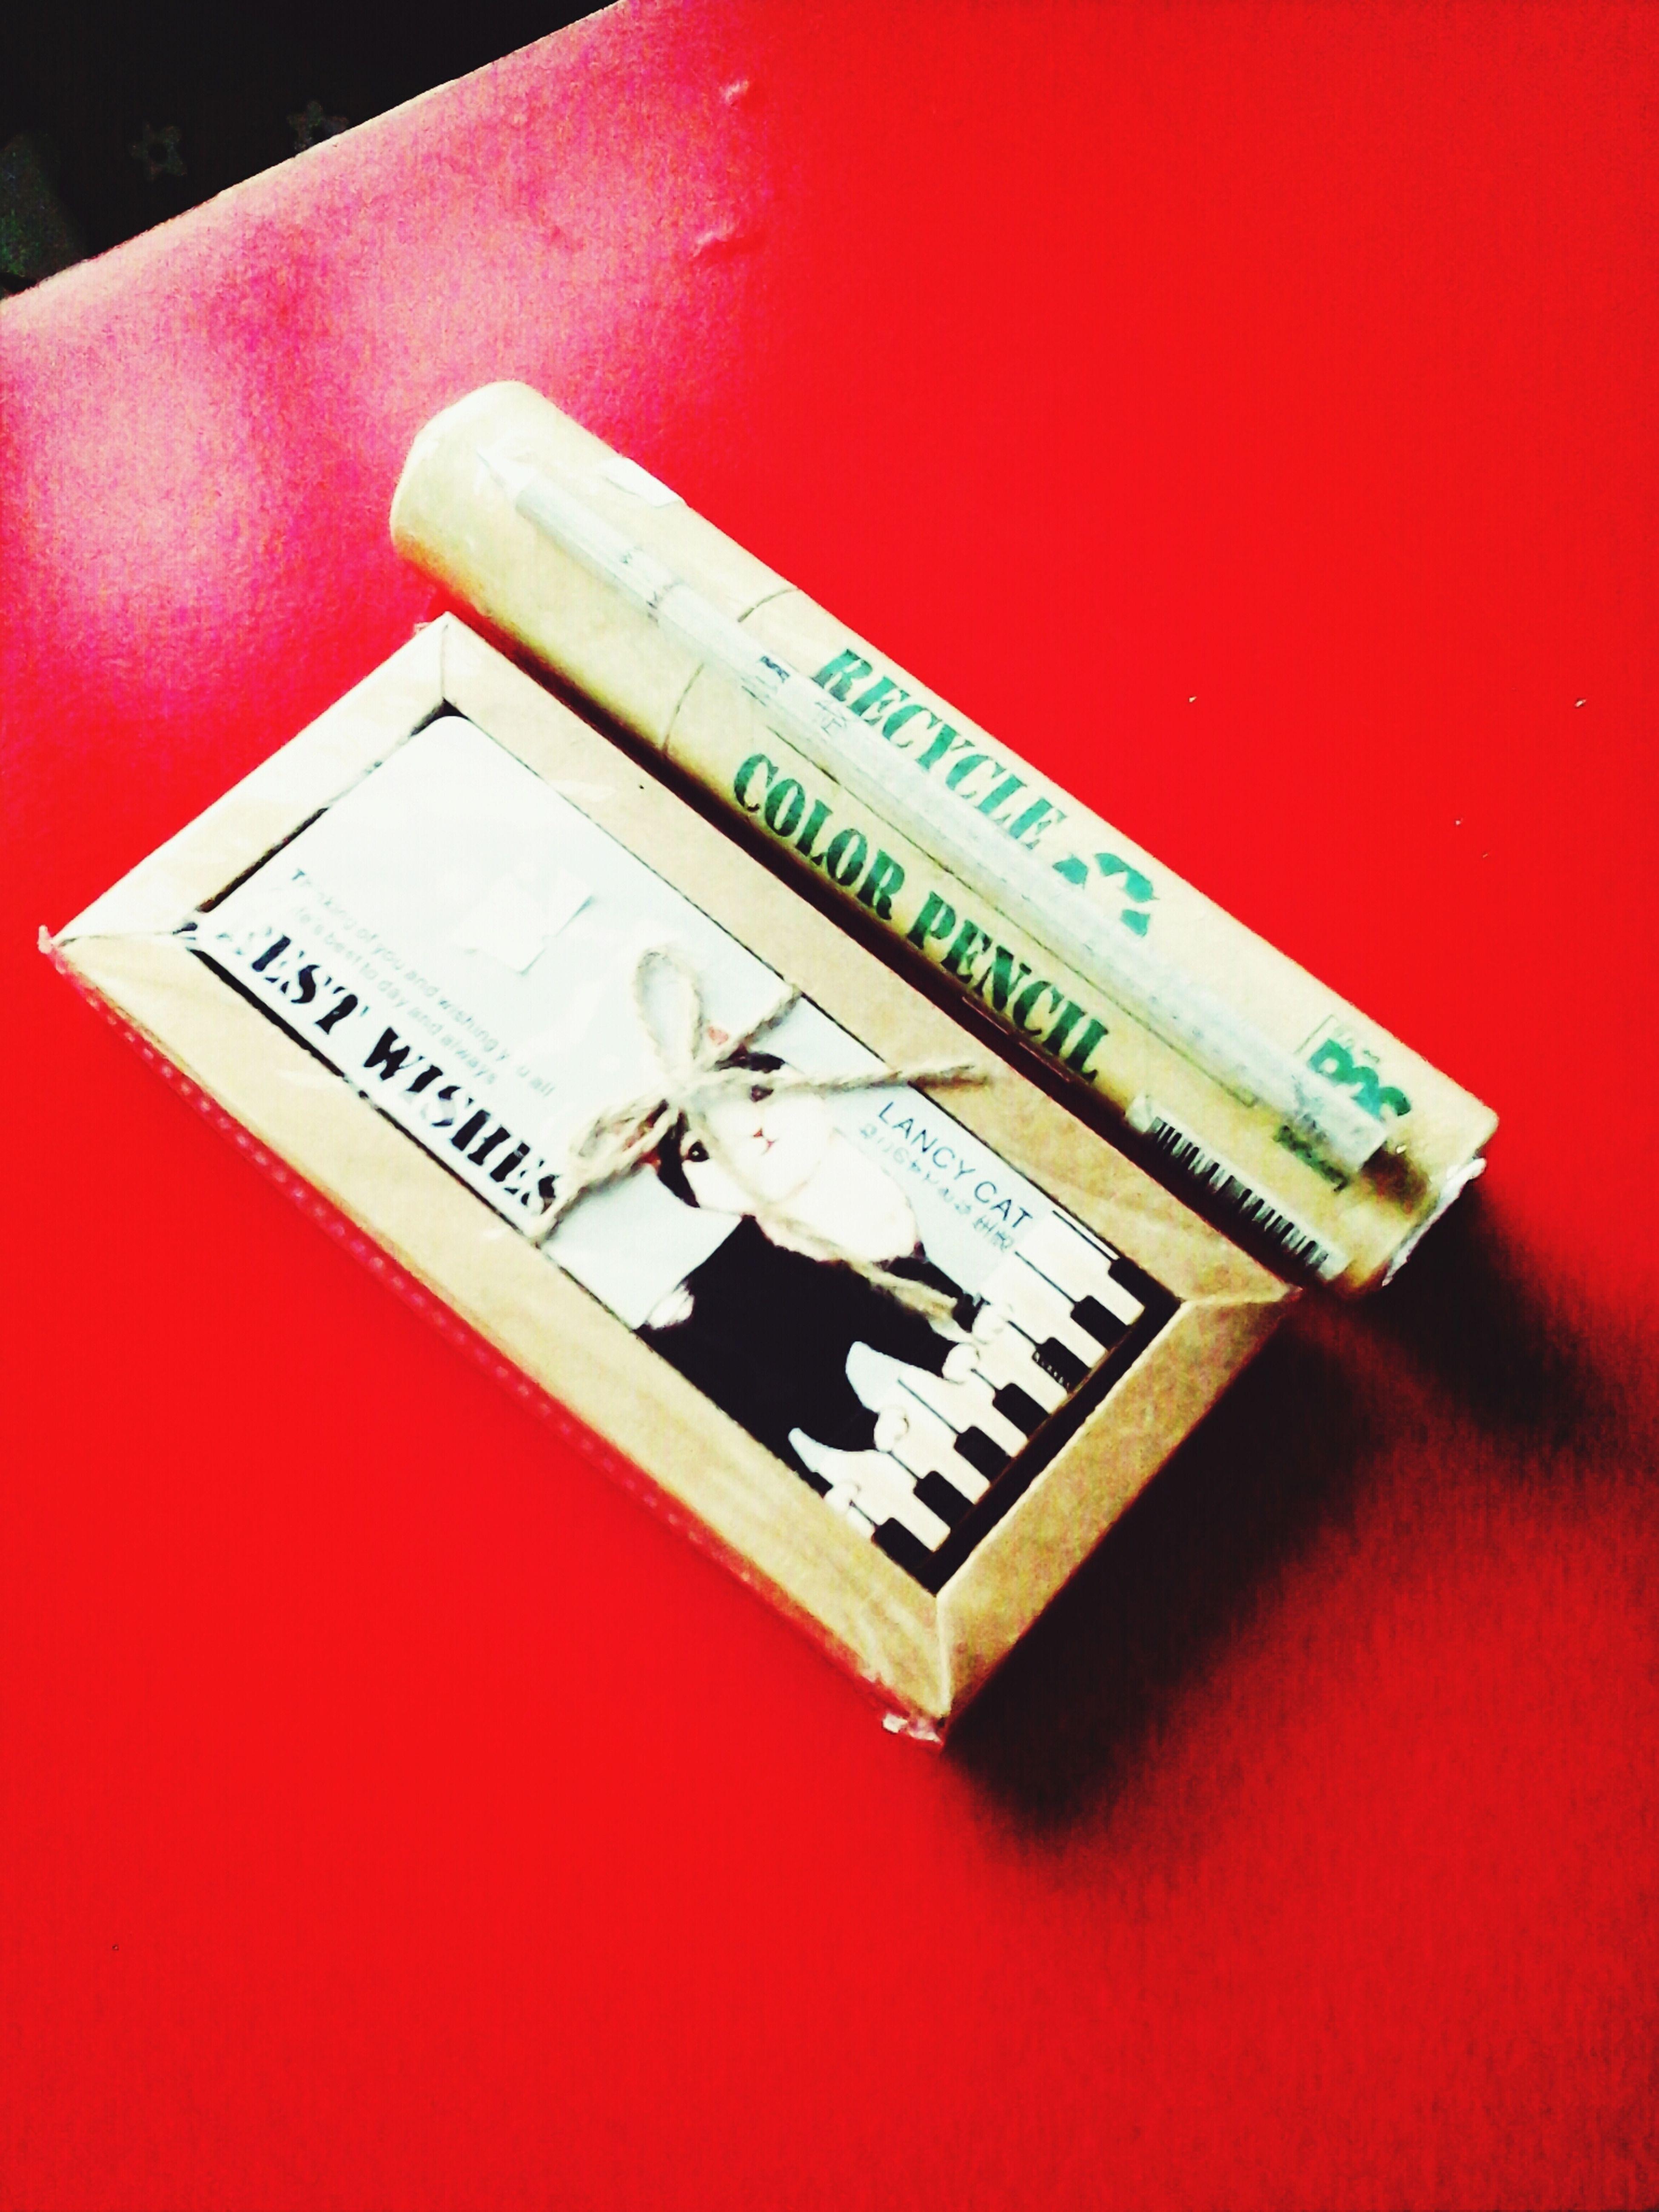 It's lovely gift from lovely teacher.iInspiration For Working Hard.. Fighting For Final.